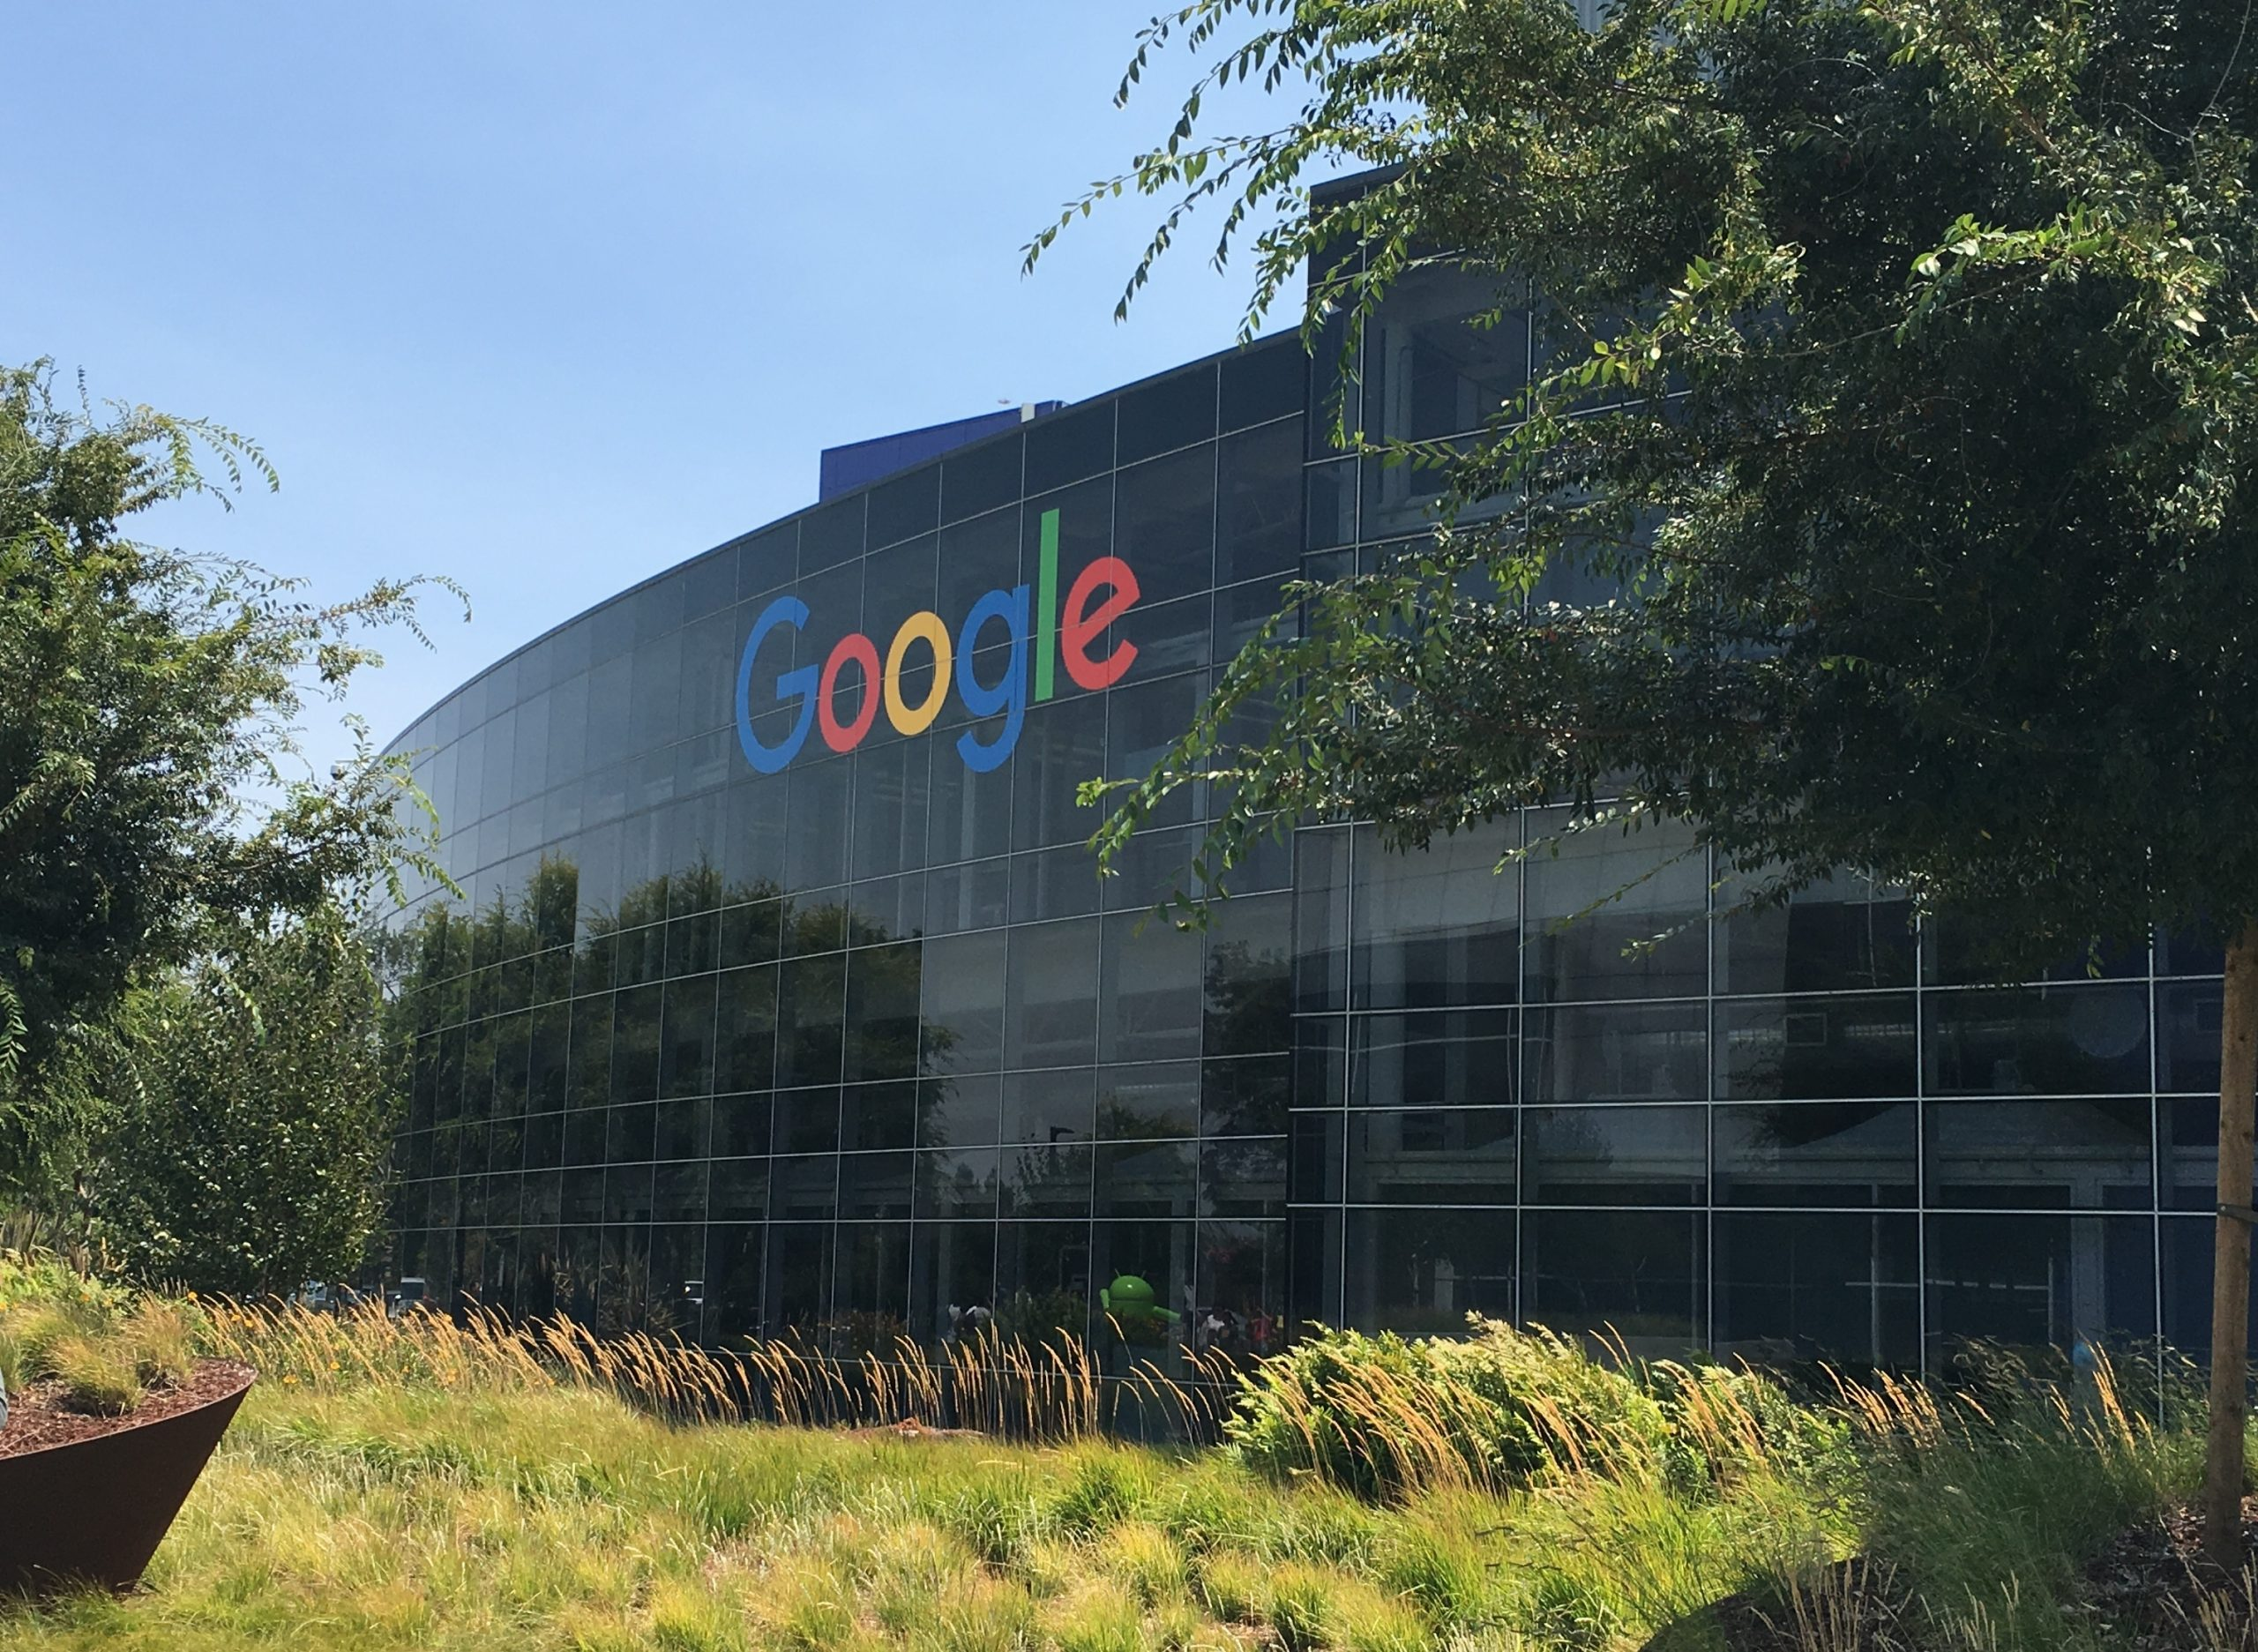 Googles hovedkvarter, Googleplex Headquarters, i californiske Mountain View. Wikipediafoto: The Pancake of Heaven!